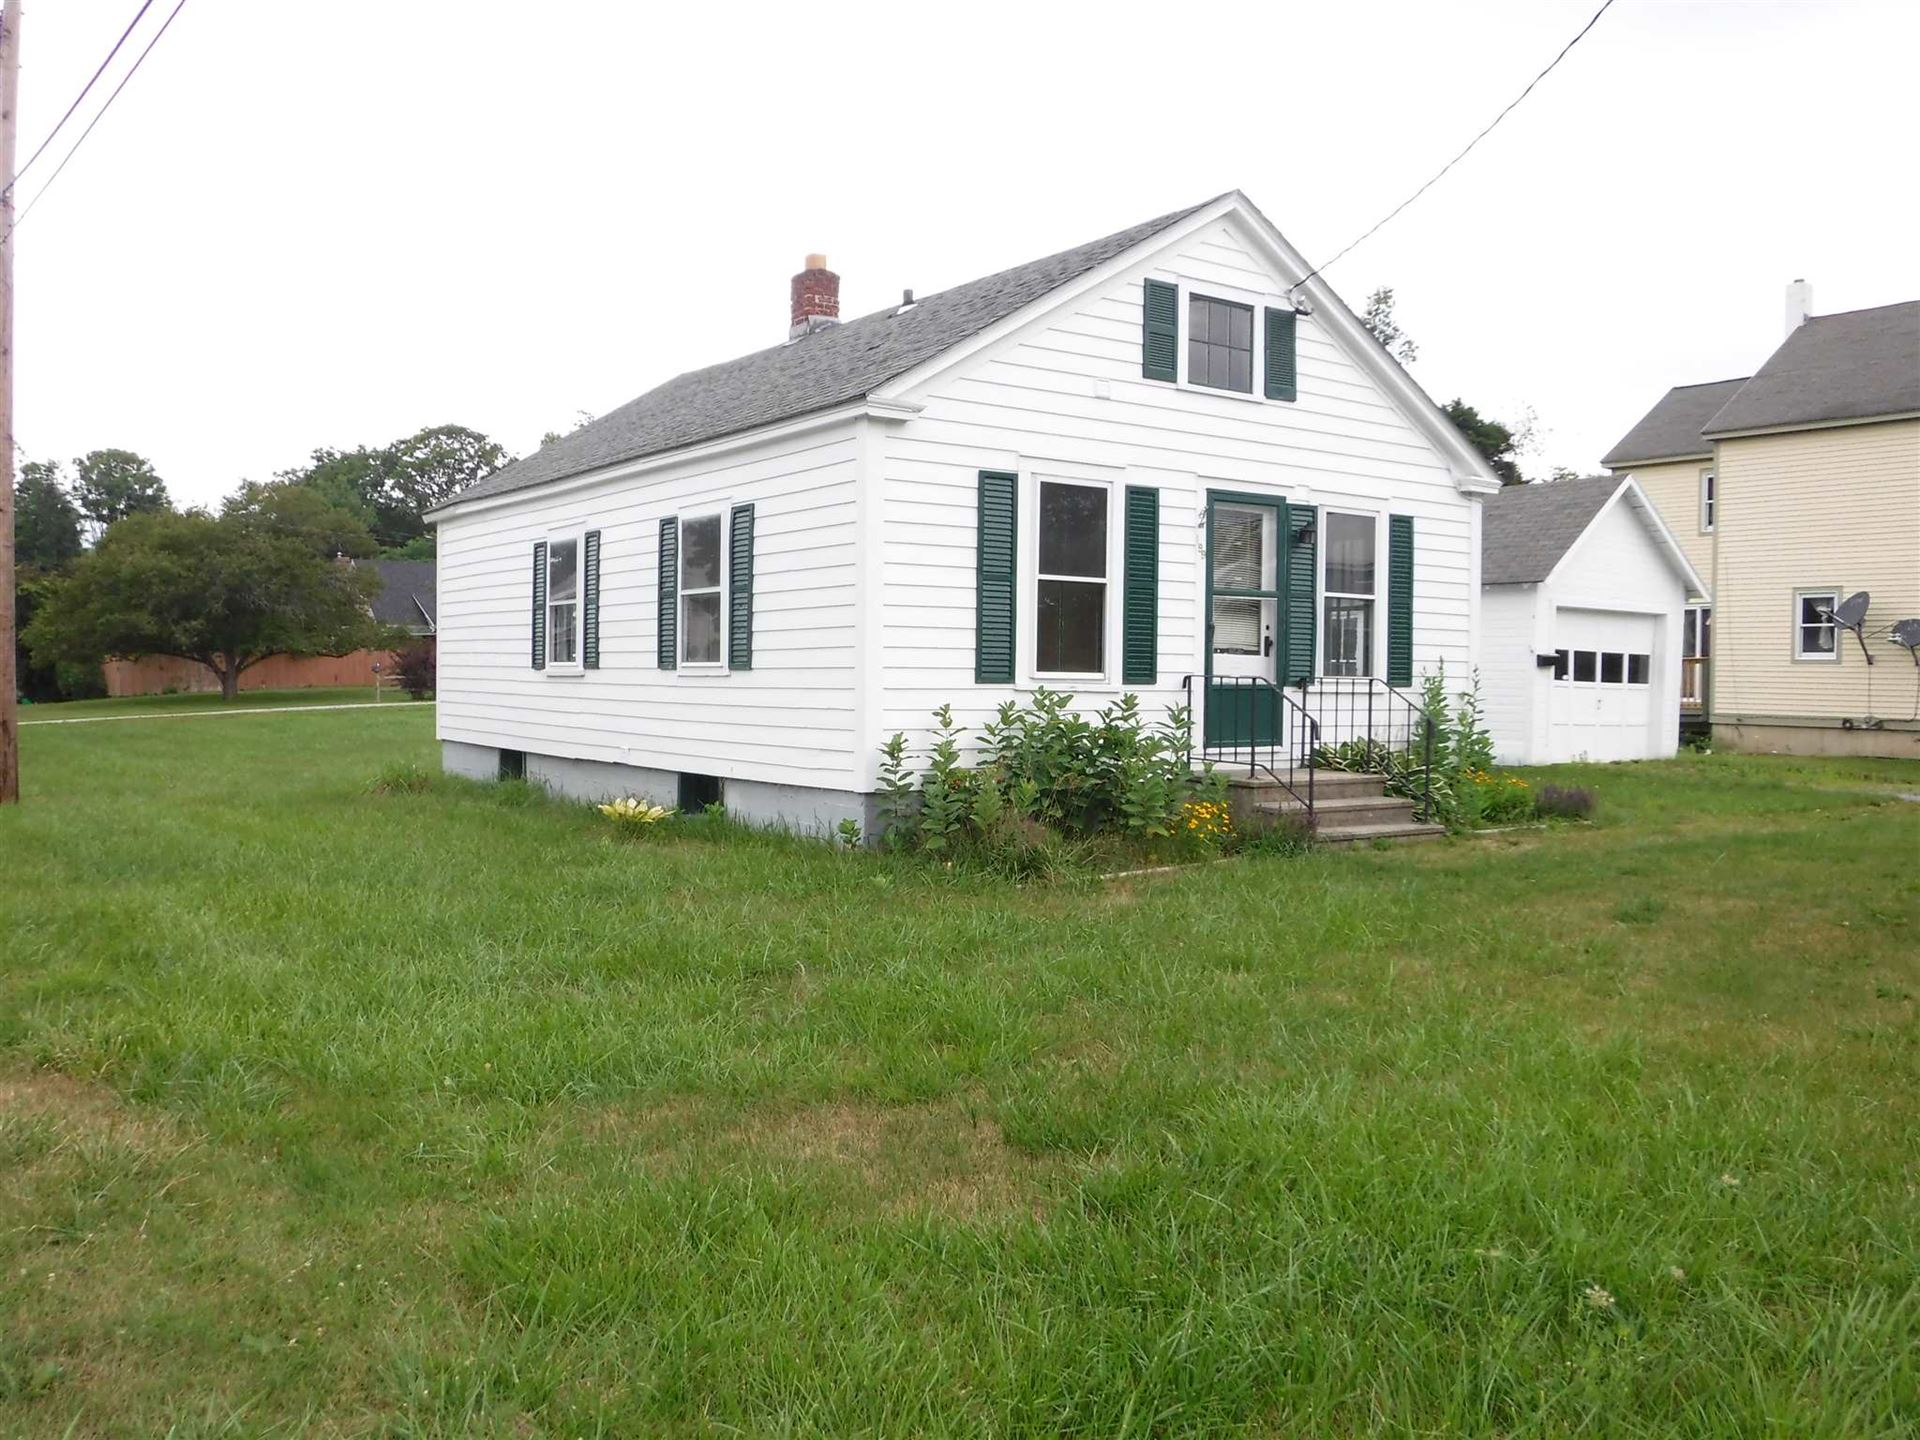 199 Lincoln Street, Rutland, VT 05701 - MLS#: 4791325